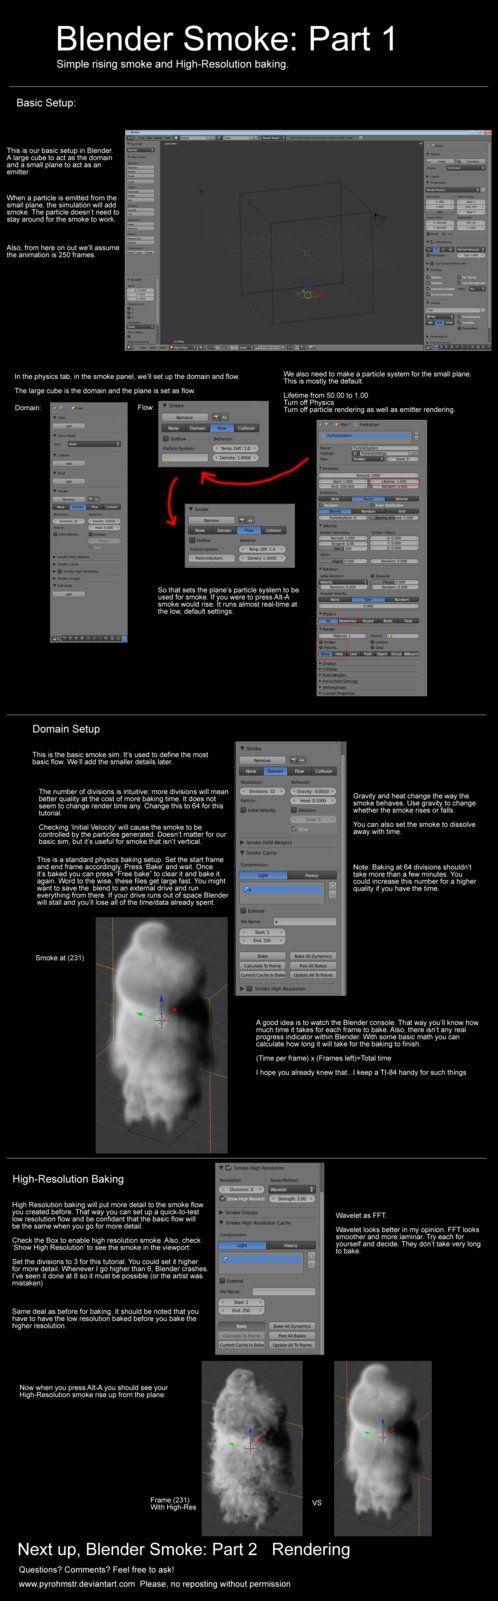 Blender Smoke Tutorial 1 by pyrohmstr